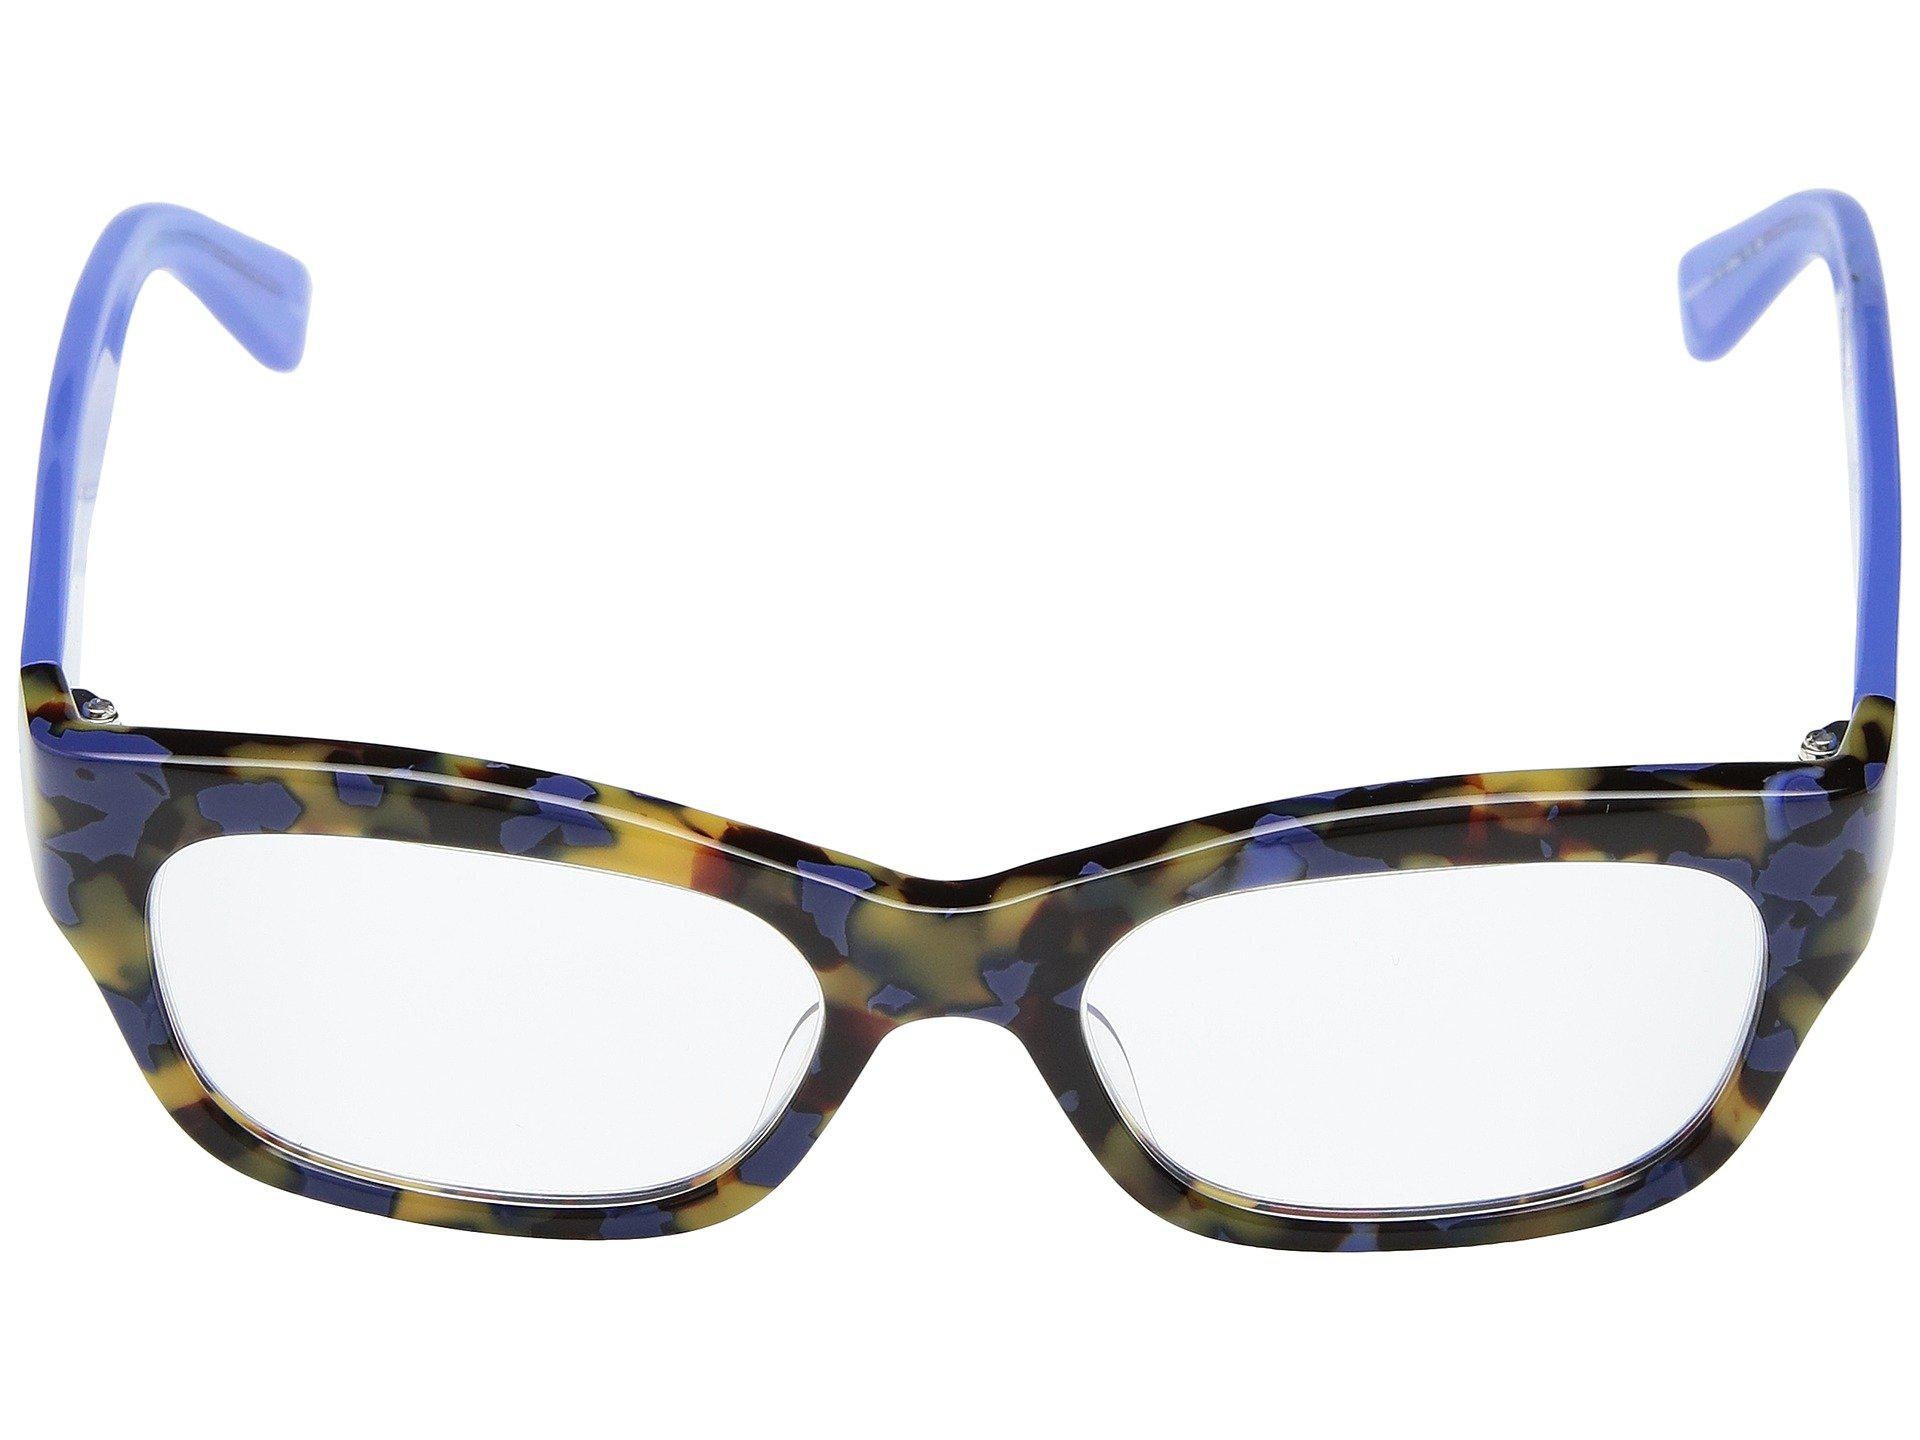 3d4cdc6d3b2 Corinne Mccormack - Blue Suzy (tortoise) Reading Glasses Sunglasses - Lyst.  View fullscreen